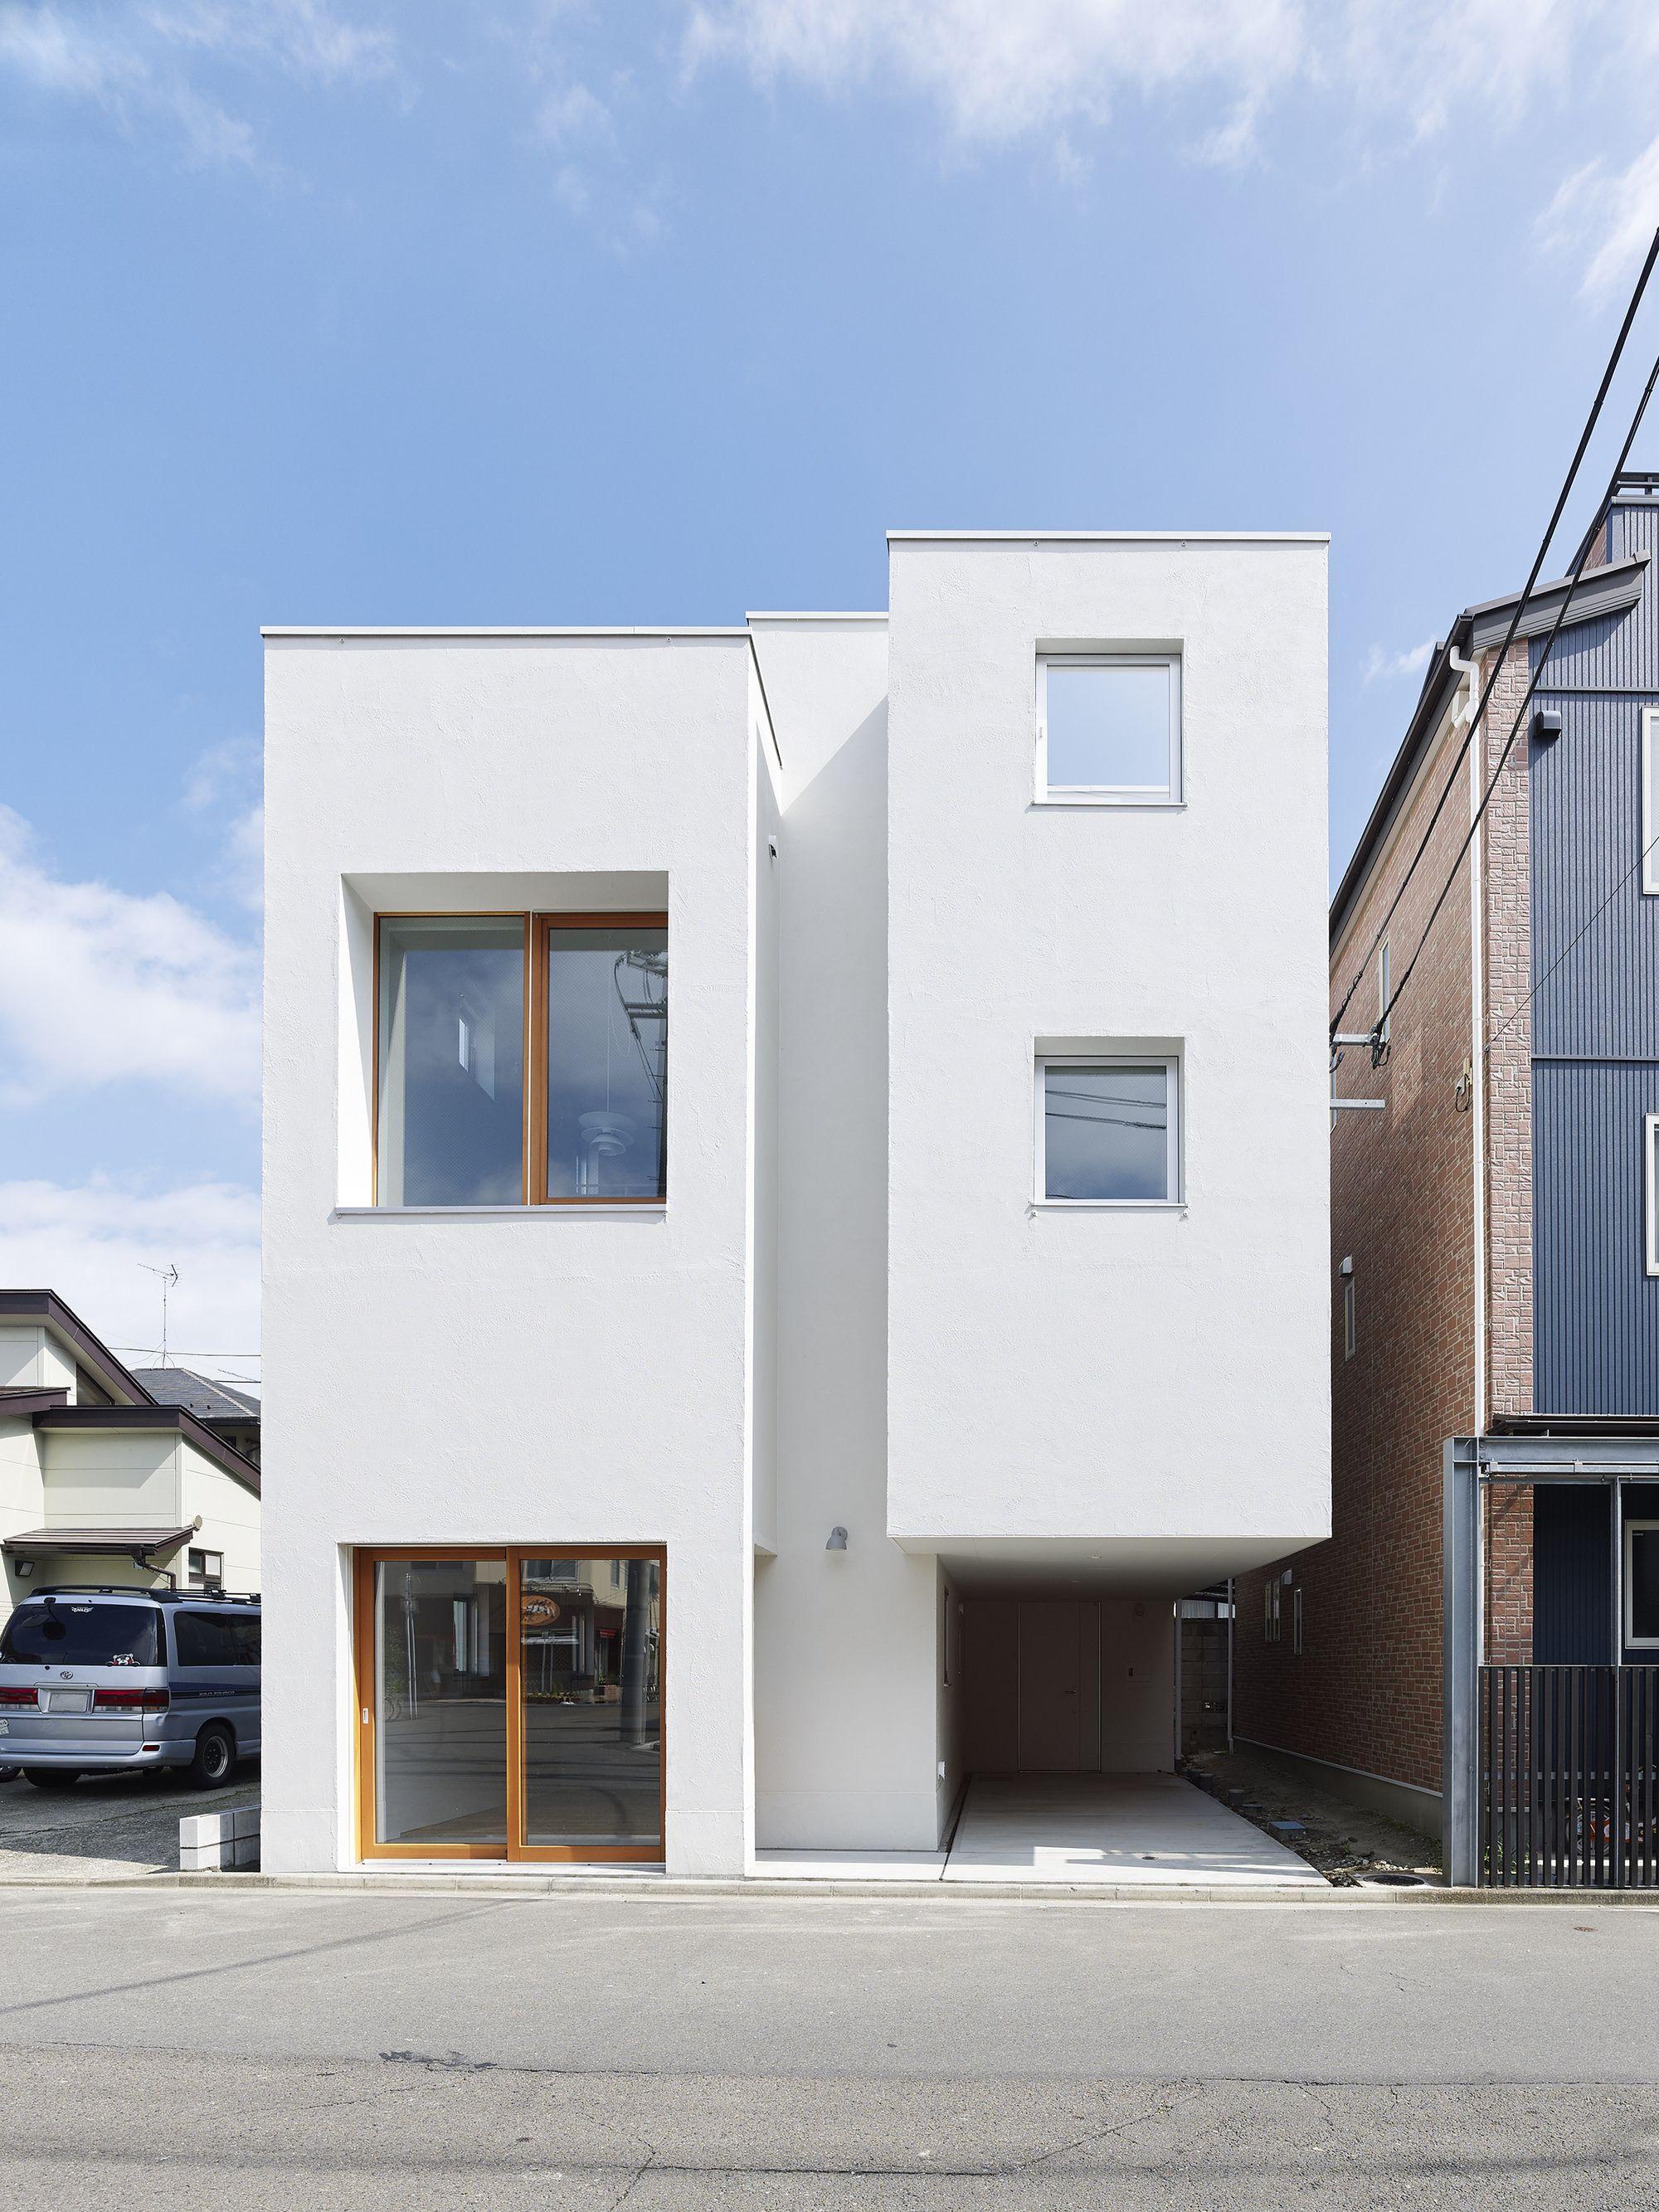 Km House Designed By Estudio Pablo Gagliardo: House Miyagino / Kazuya Saito Architects